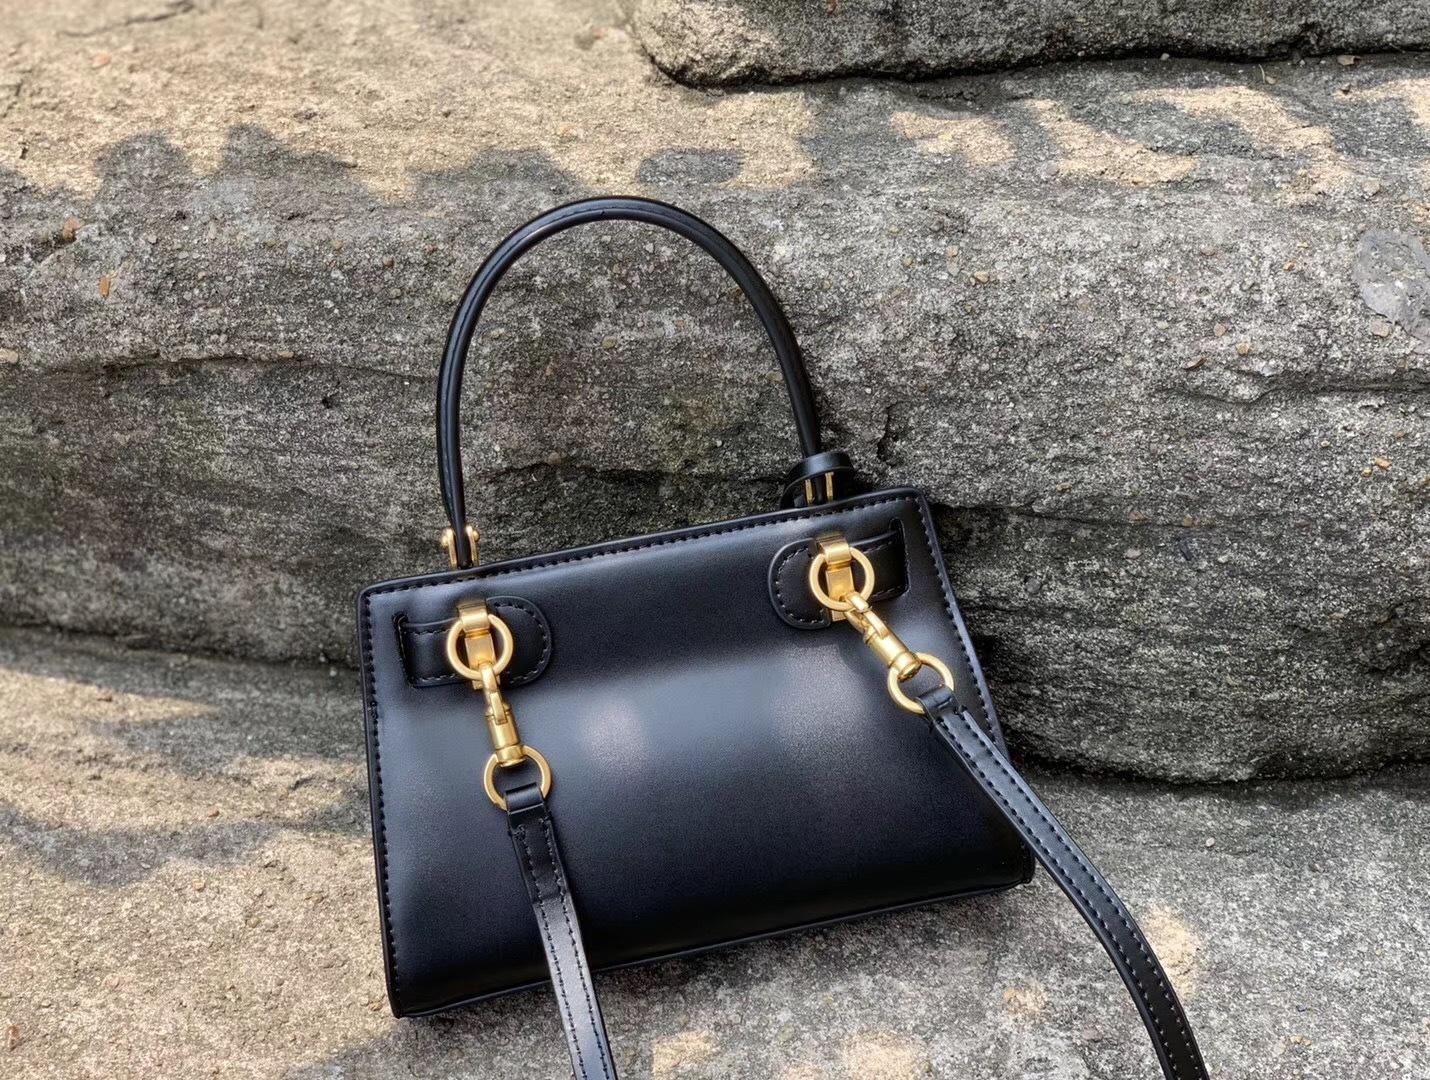 Tory Burch Lee Radziwill Leather Petite Bag